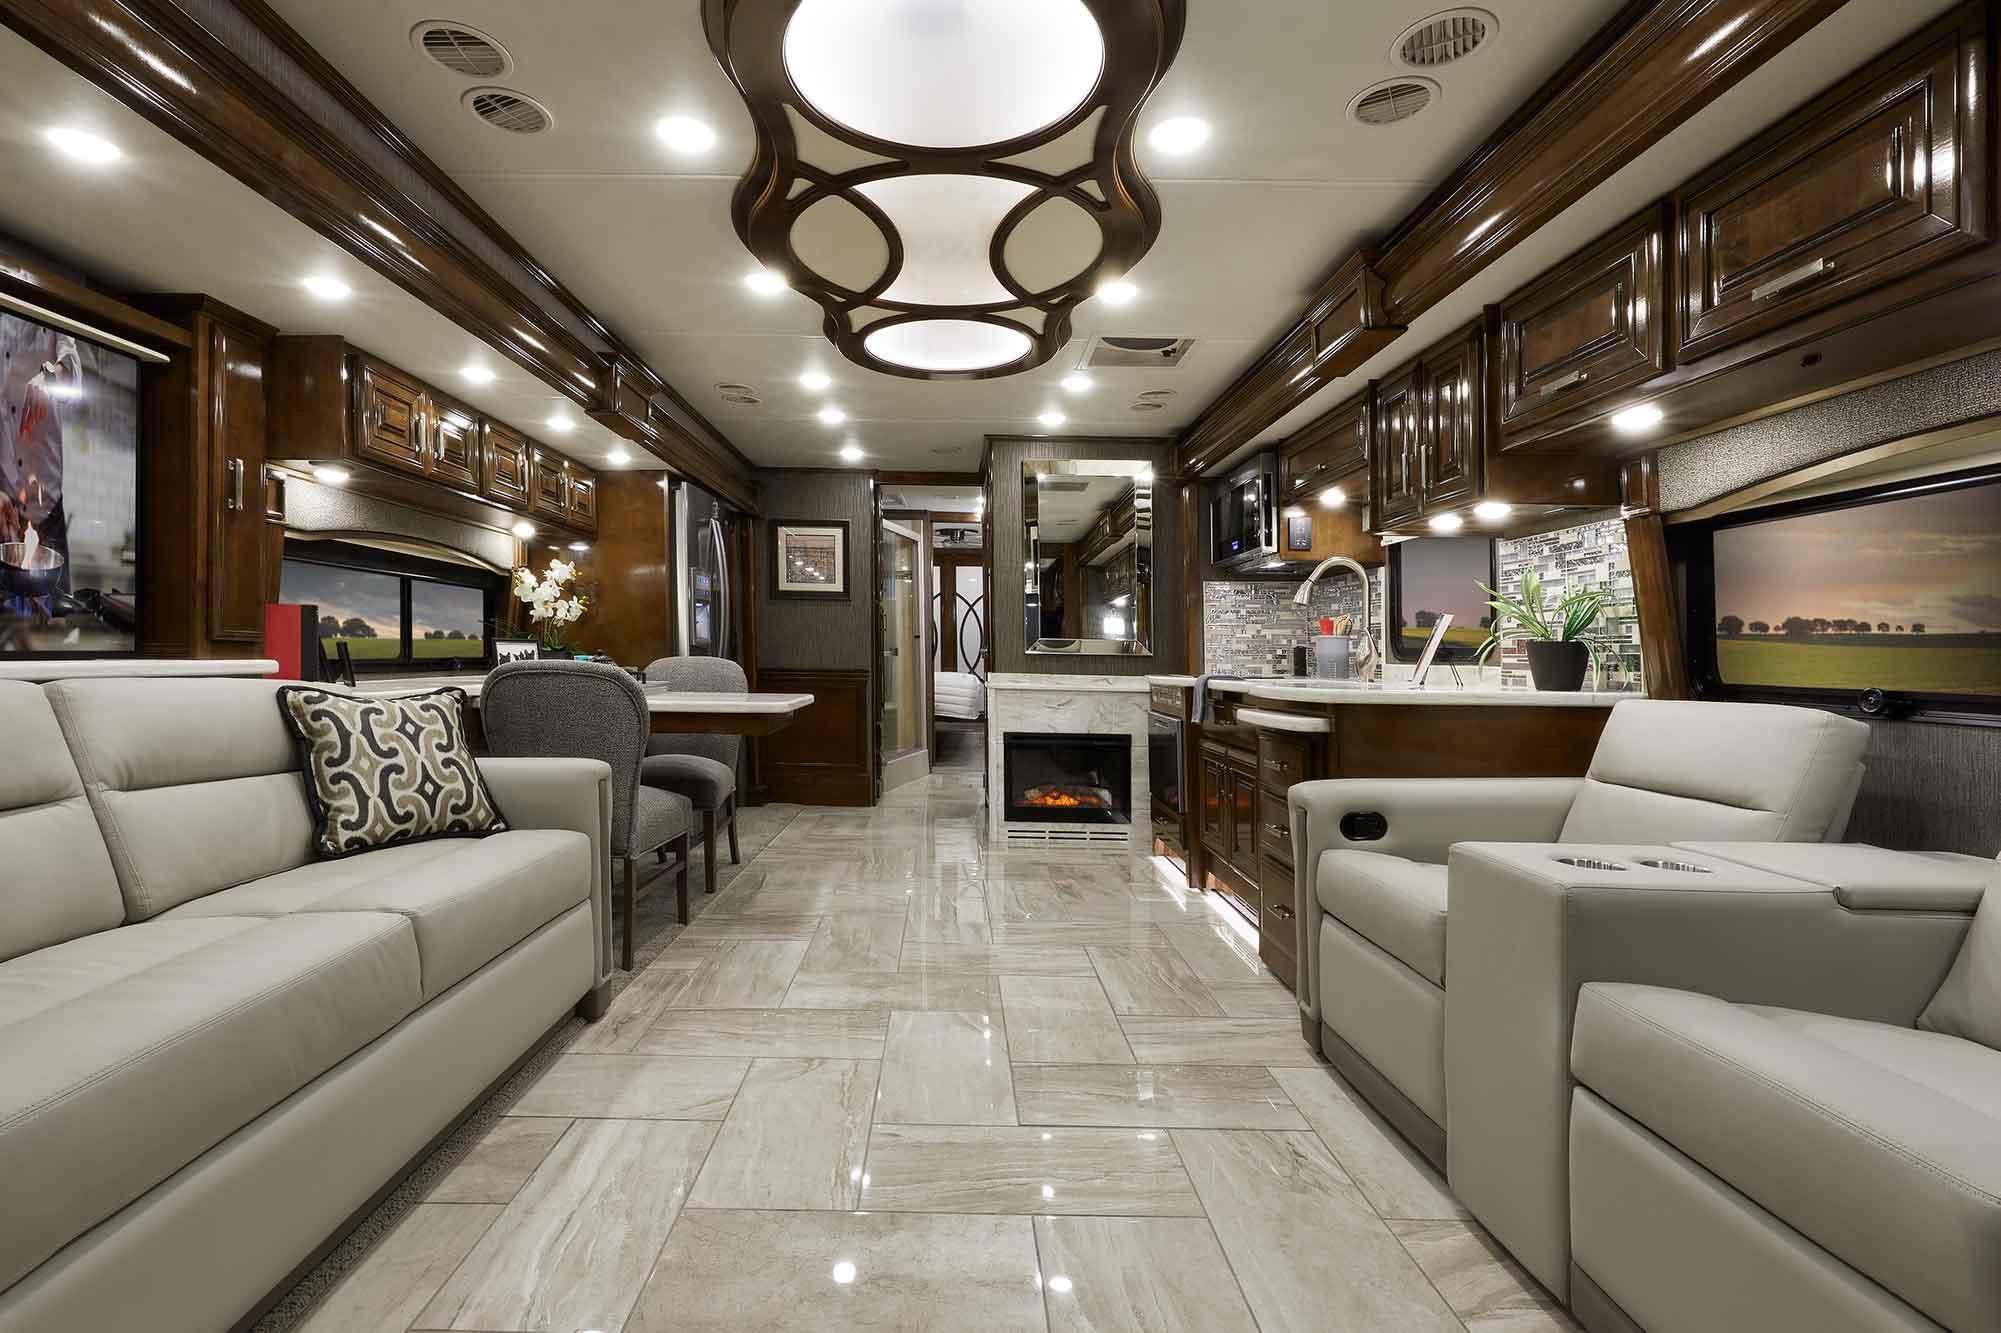 Tuscany Class A Diesel Luxury Motorhome Thor Motor Coach